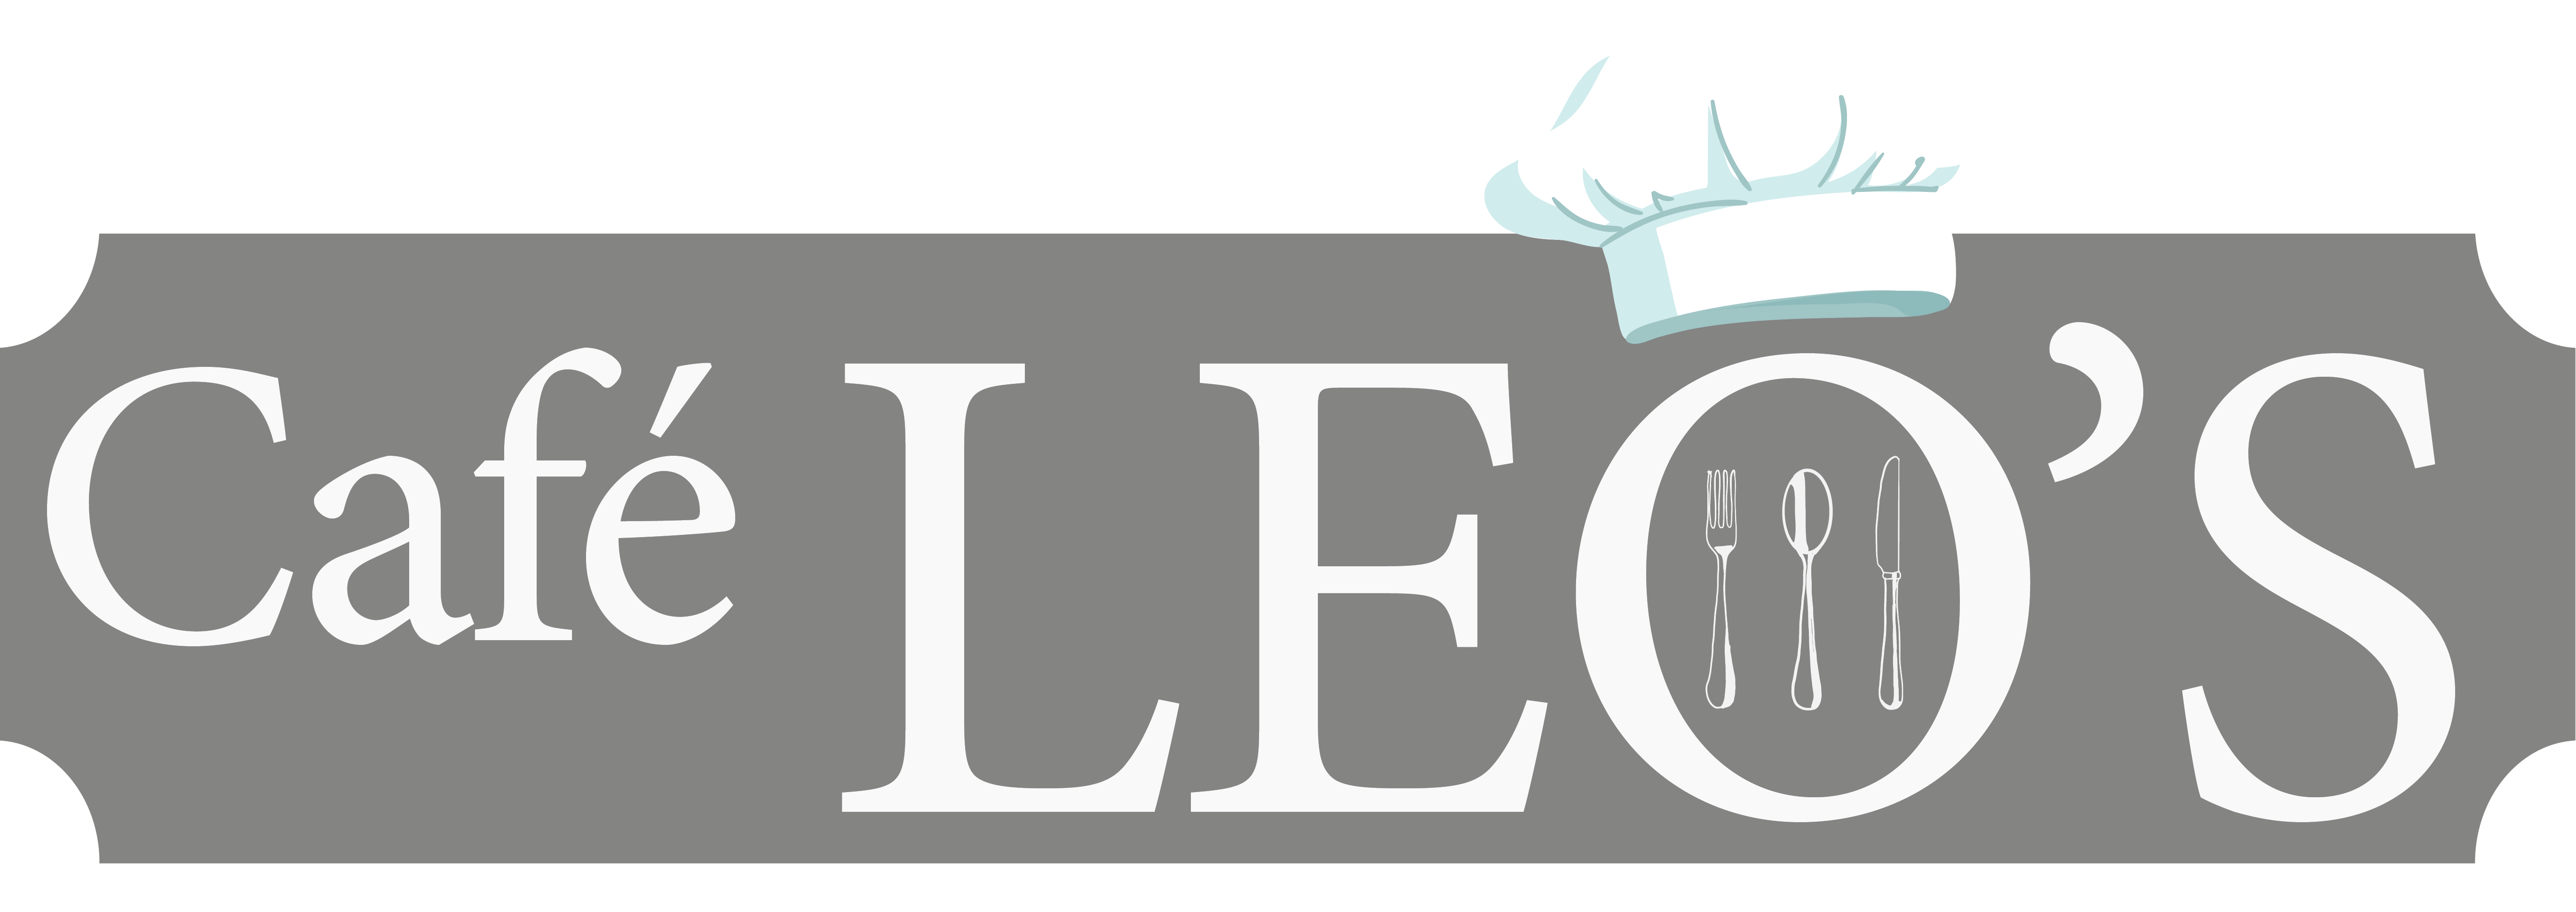 Cafe LEO'S